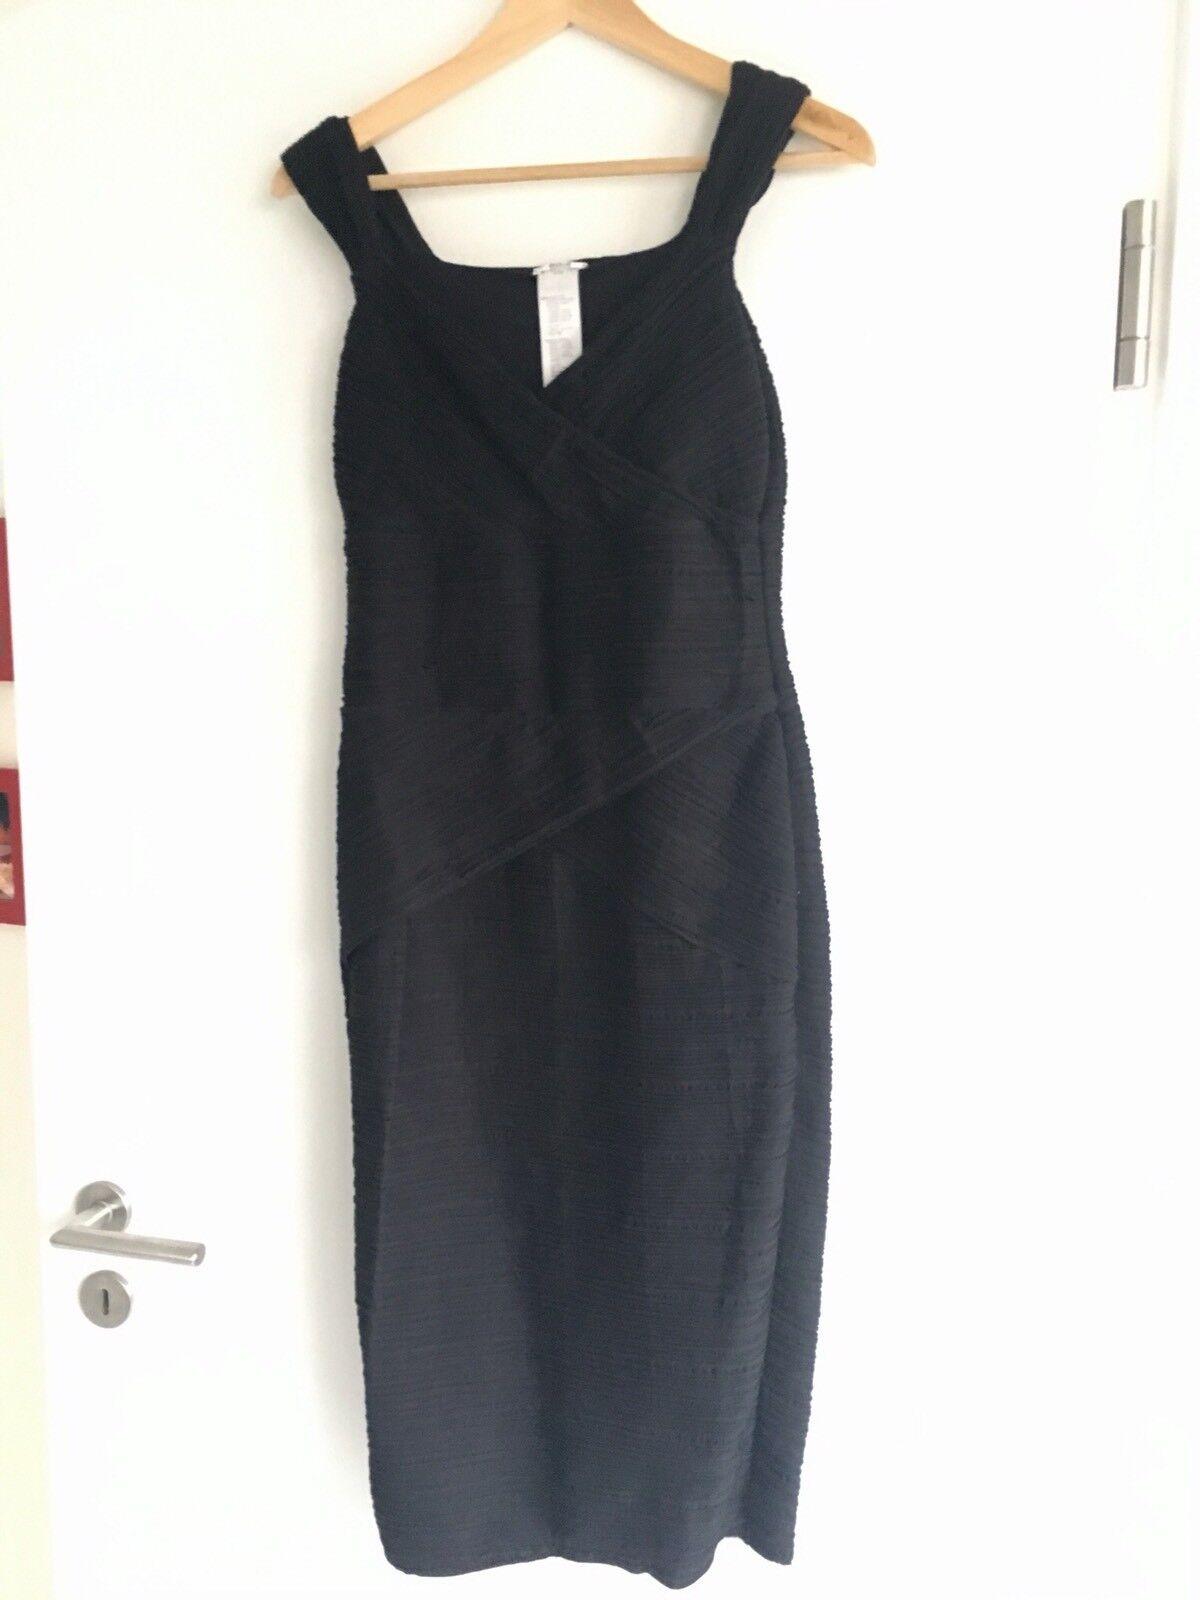 Traumhaftes Wolford Kleid Gr. S schwarz - wie neu